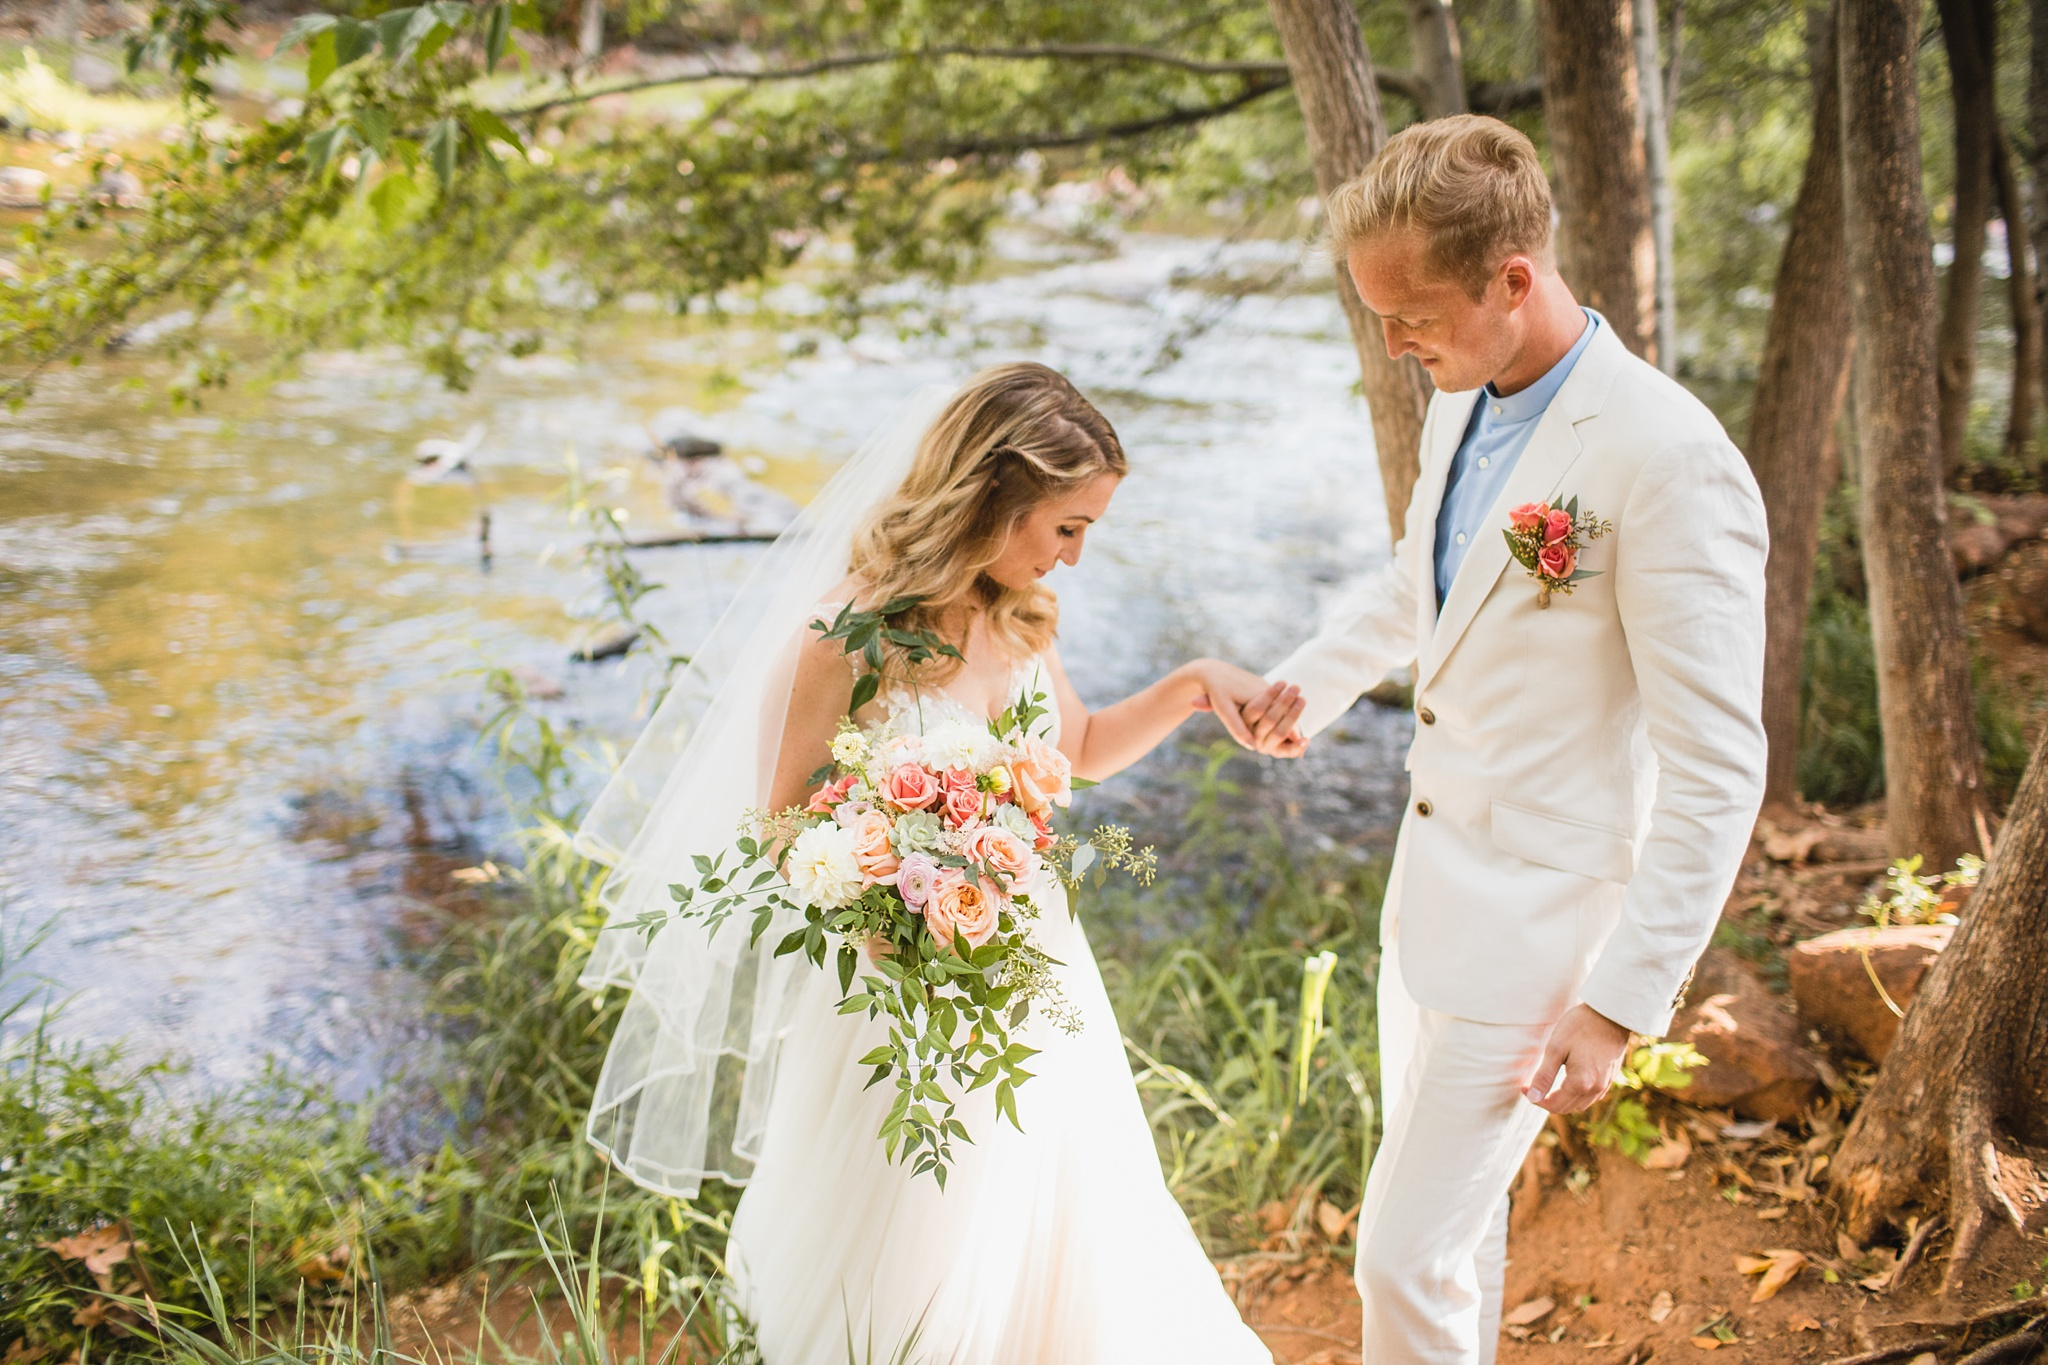 lauberge-sedona-wedding-katrinawallace.com